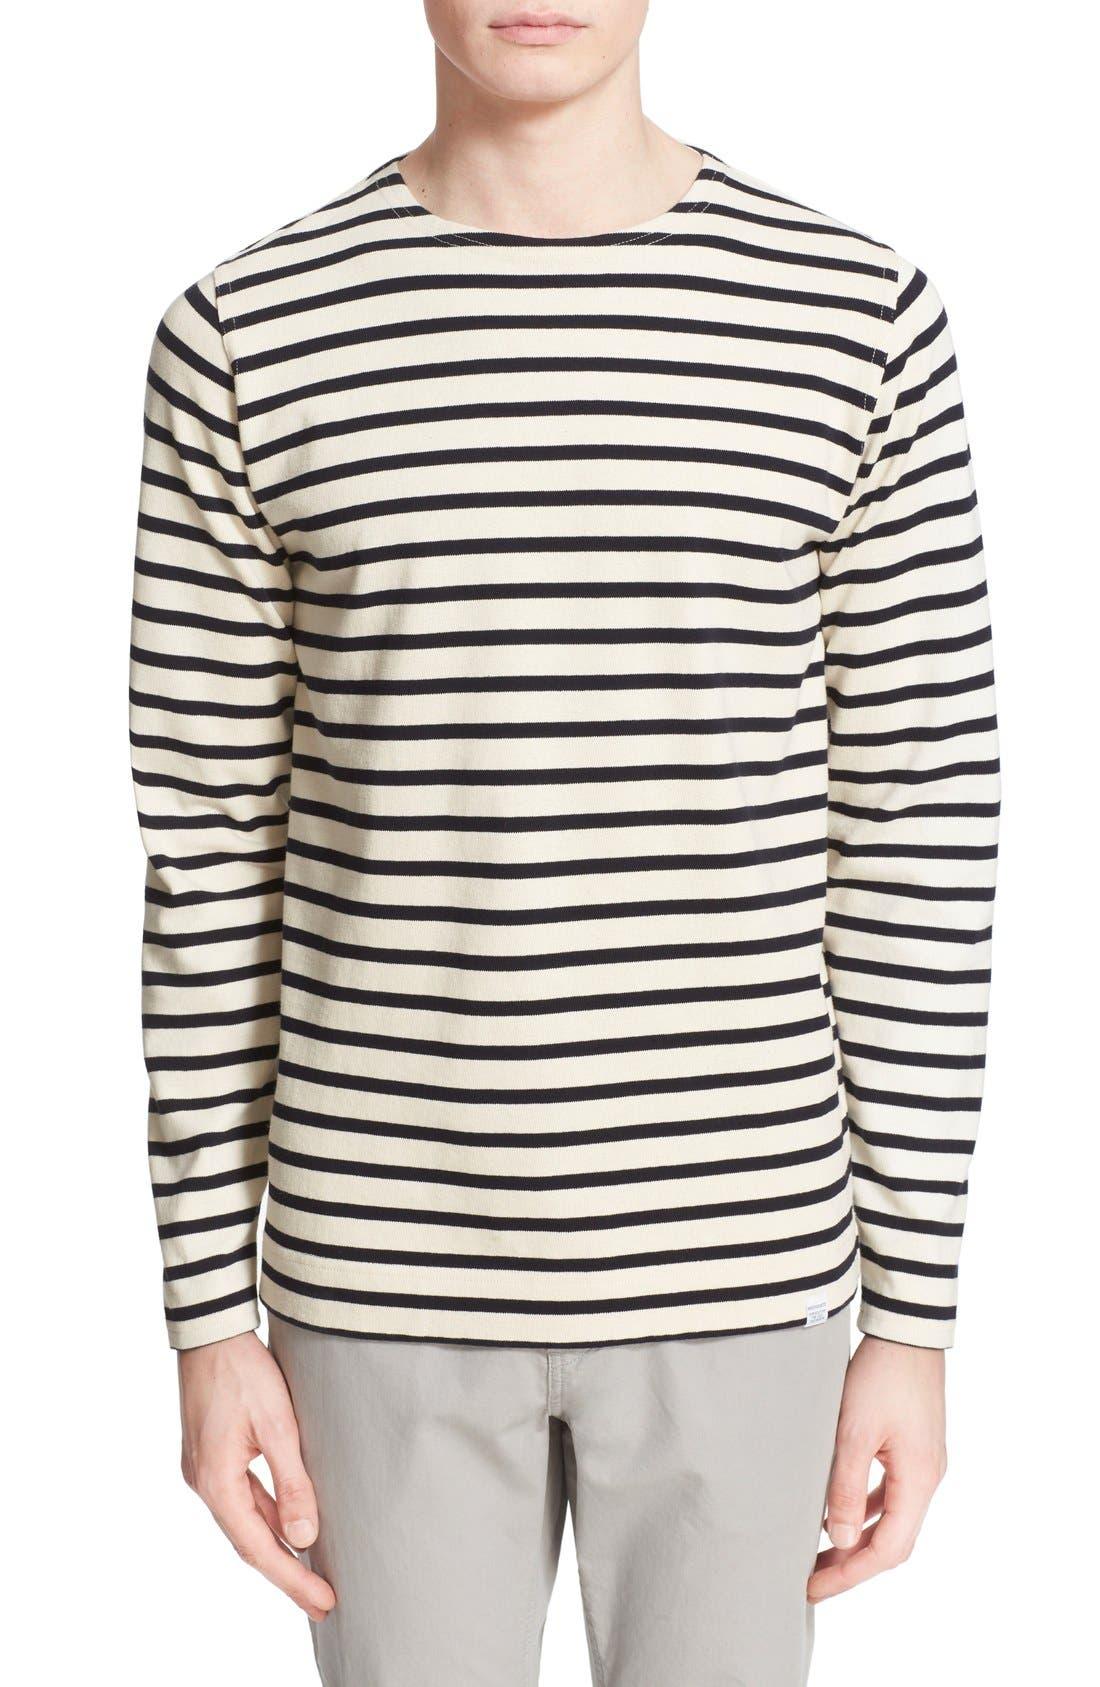 'Godtfred' Stripe Long Sleeve T-Shirt,                             Main thumbnail 1, color,                             Ecru Navy